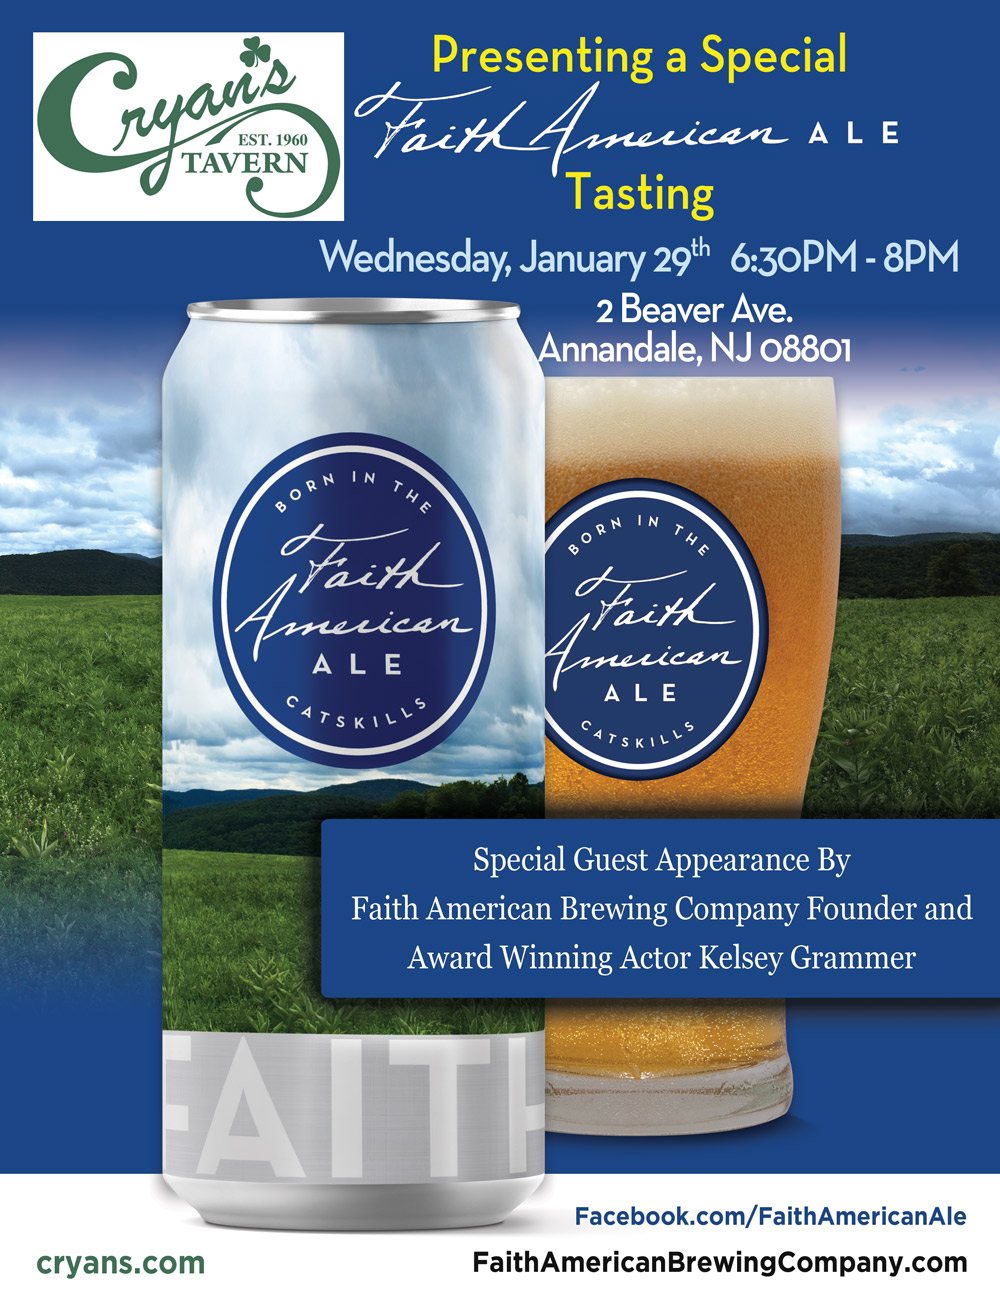 Faith American Ale Tasting at Cryan's Tavern